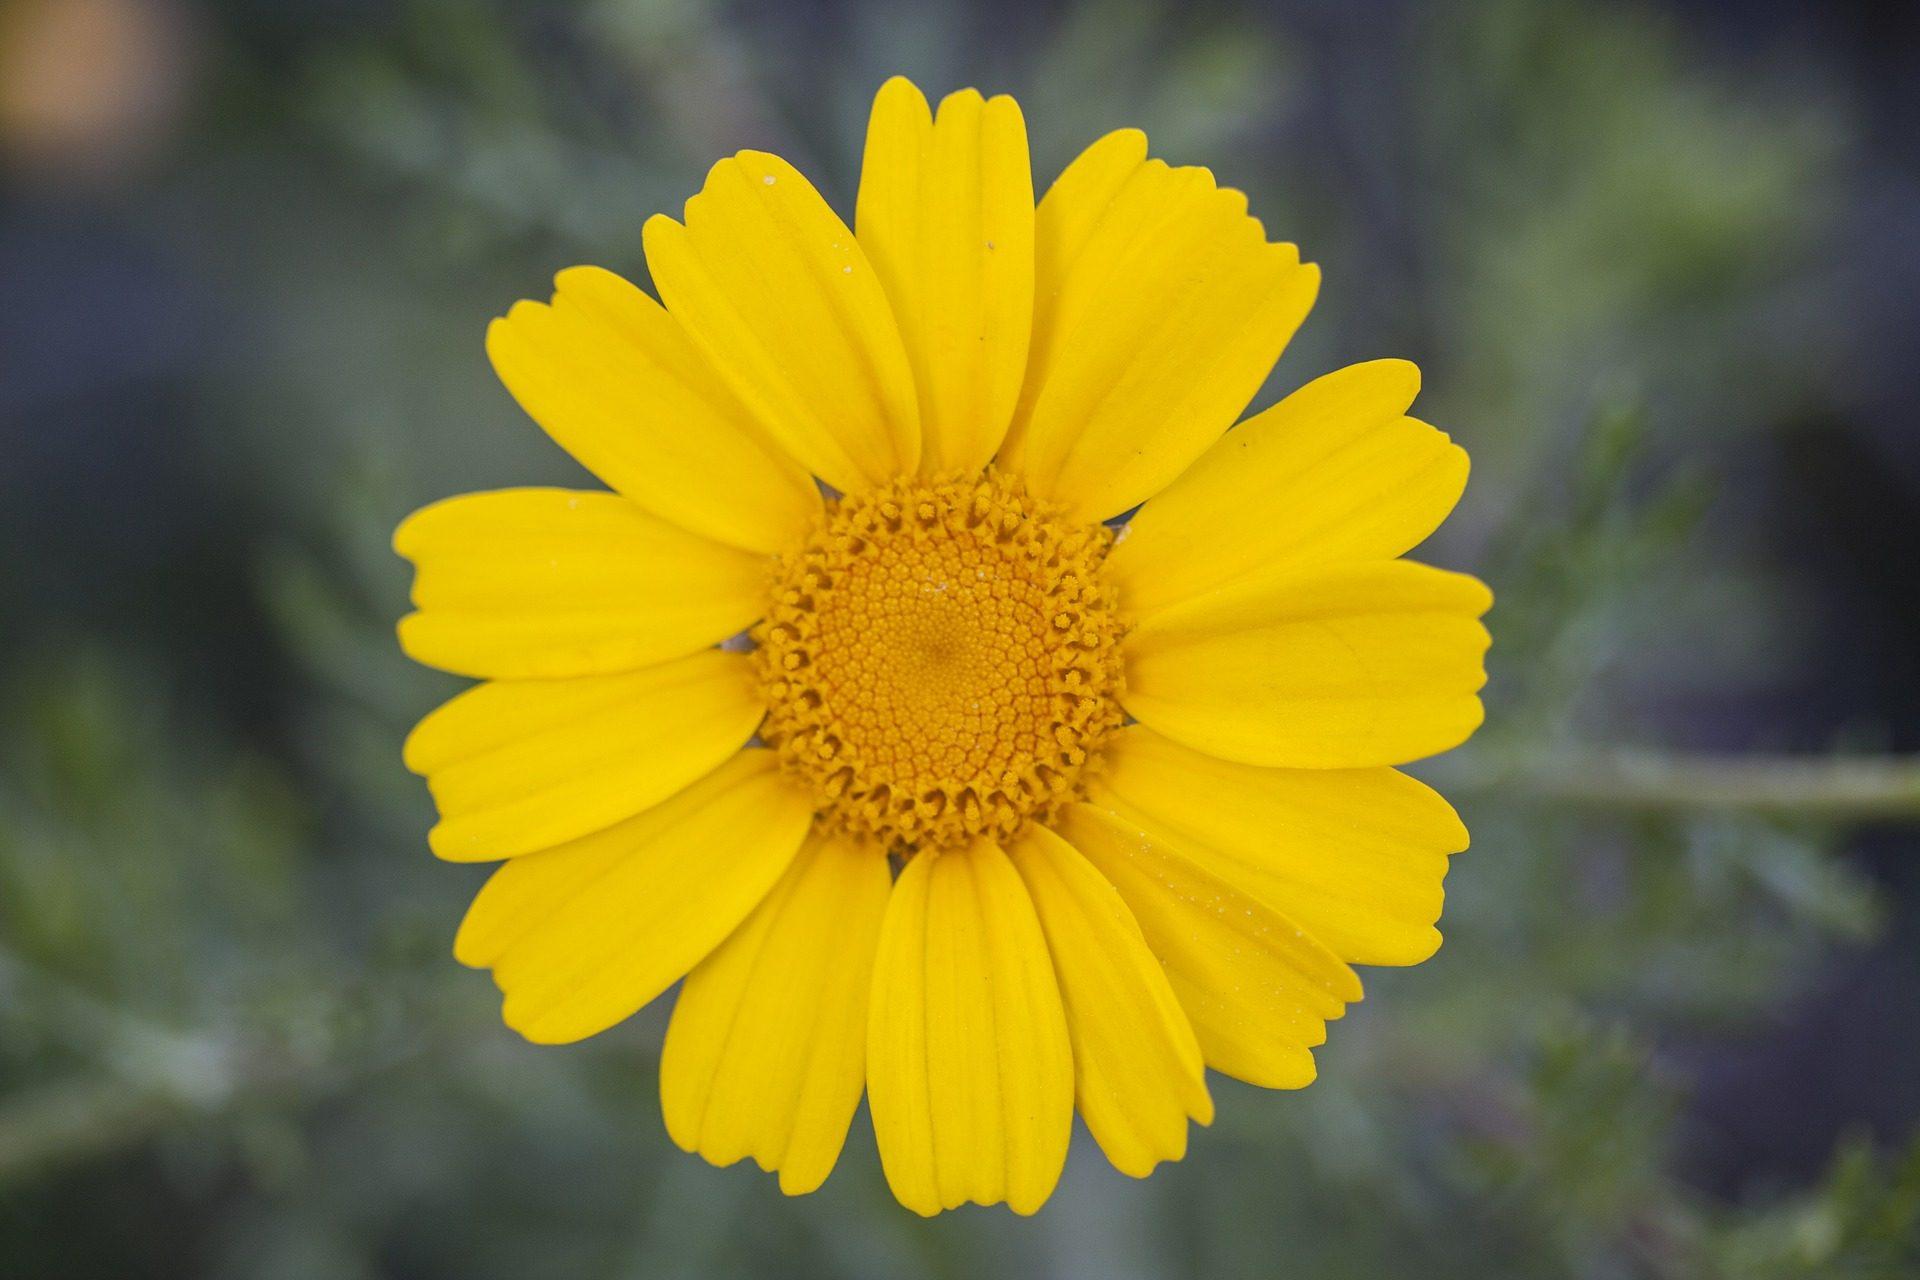 margarita, flor, pétalos, amarilla, polen, de cerca - Fondos de Pantalla HD - professor-falken.com